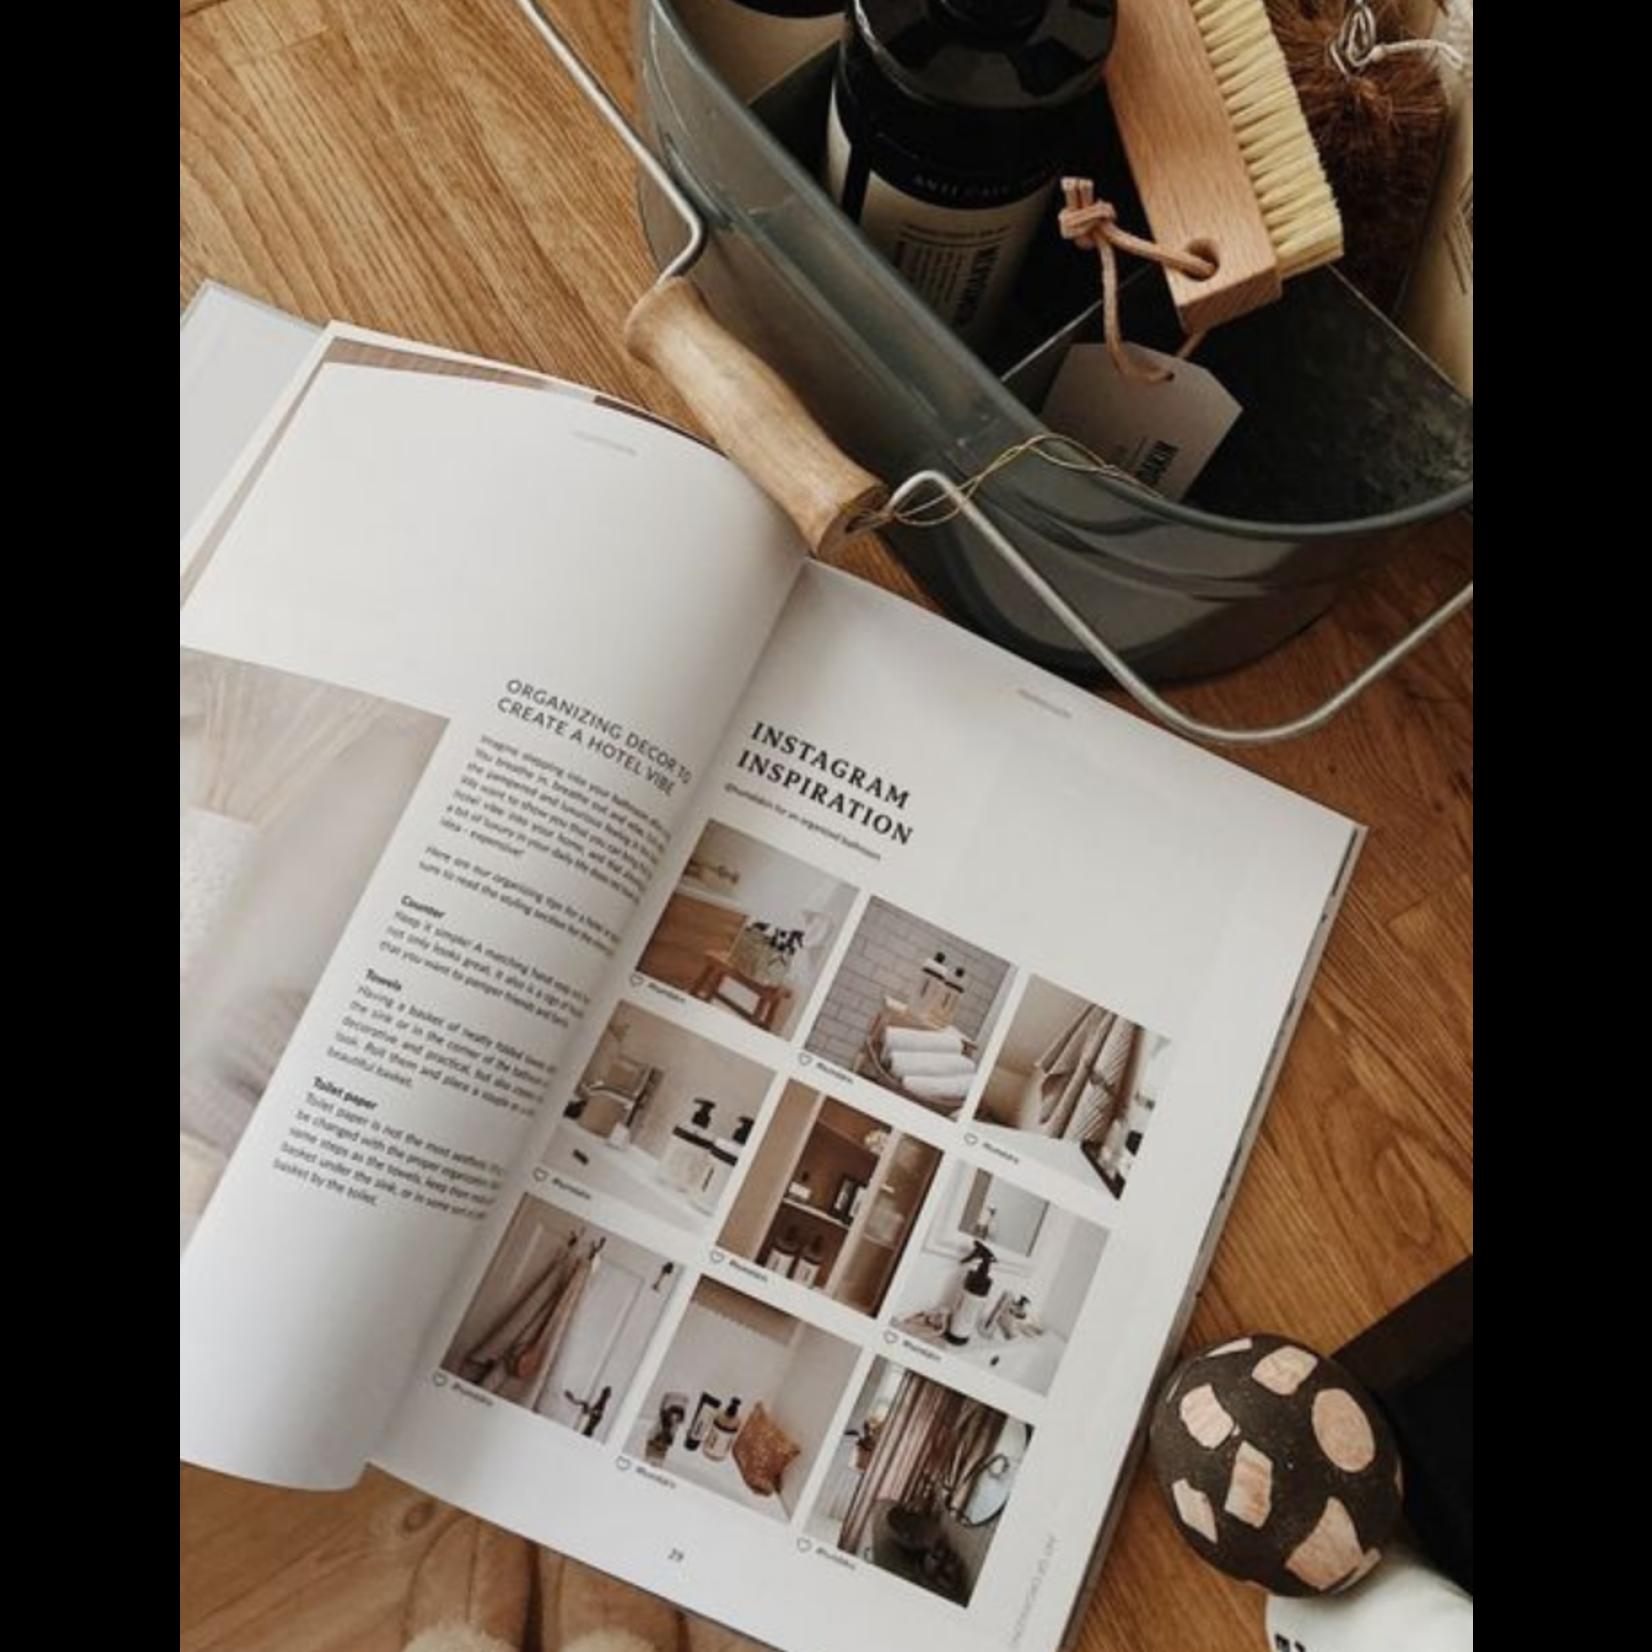 humdakin humdakin - the art of organizing, cleaning and styling